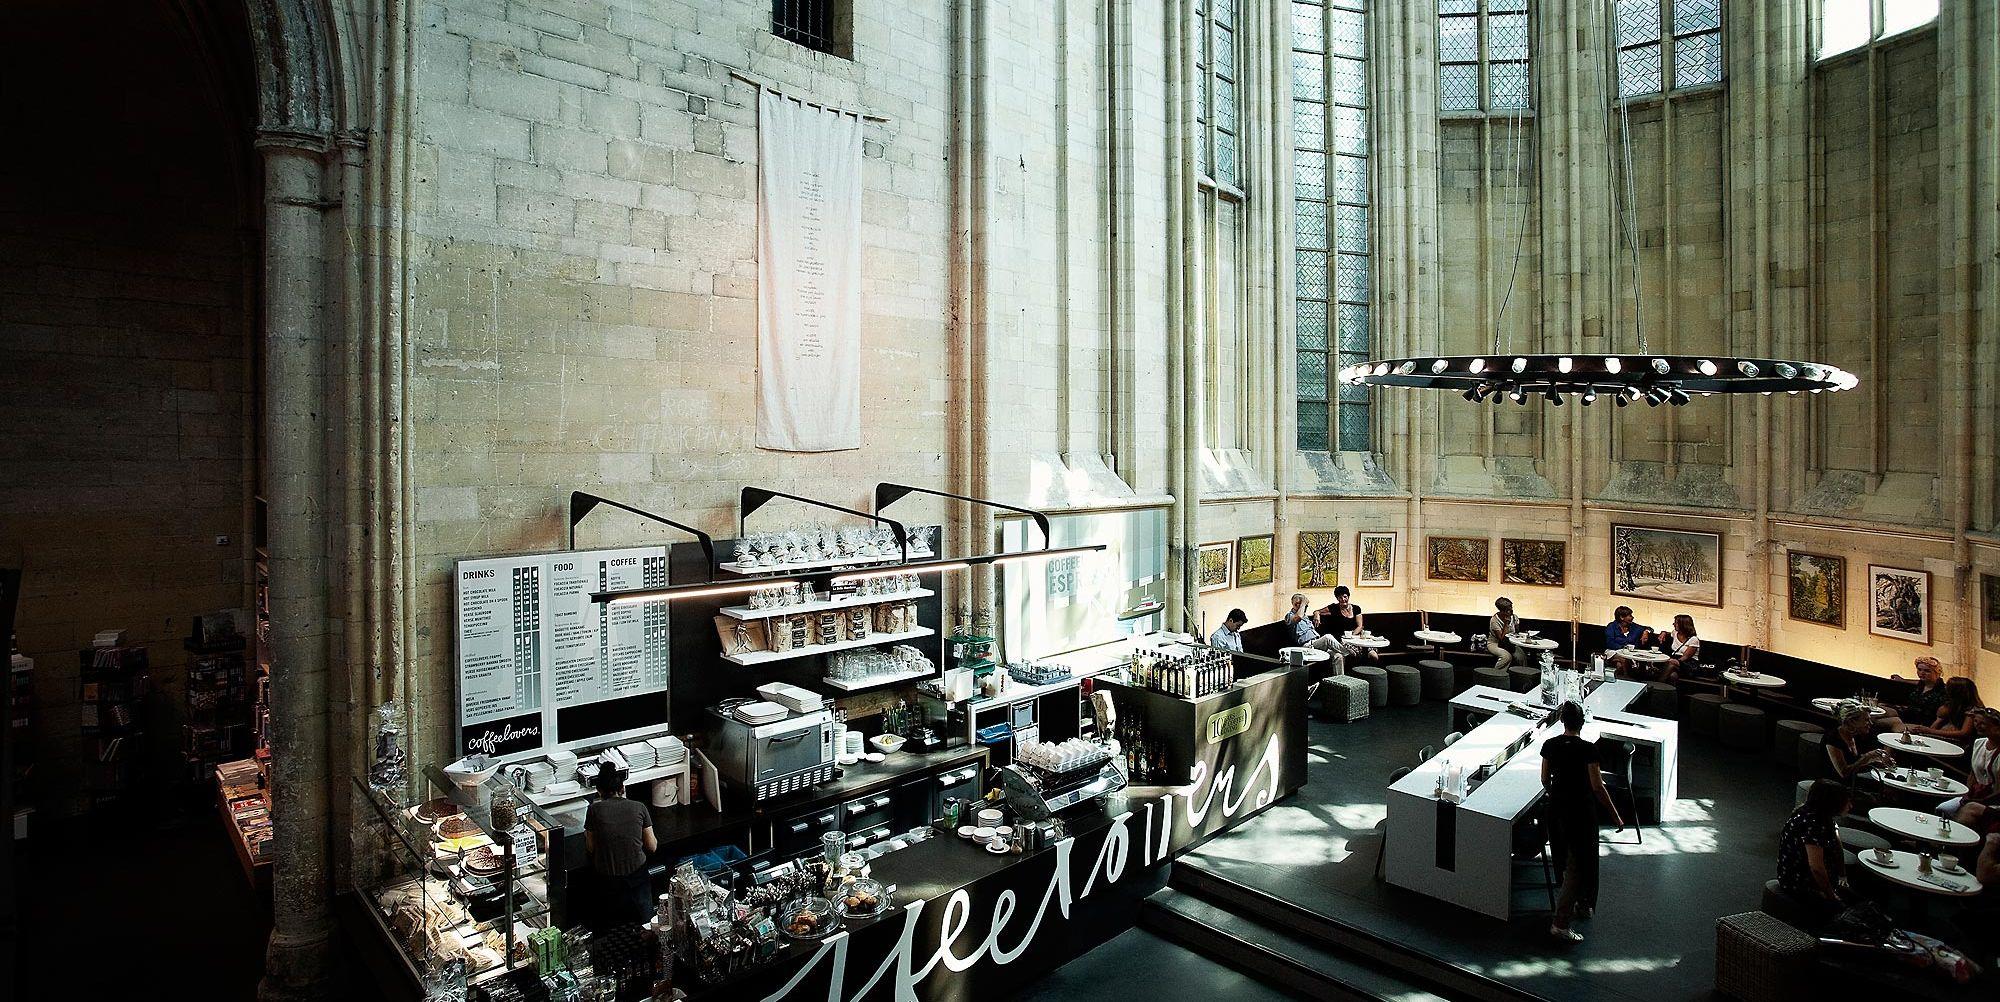 maastricht-restaurants-koffie-tips-hotspots